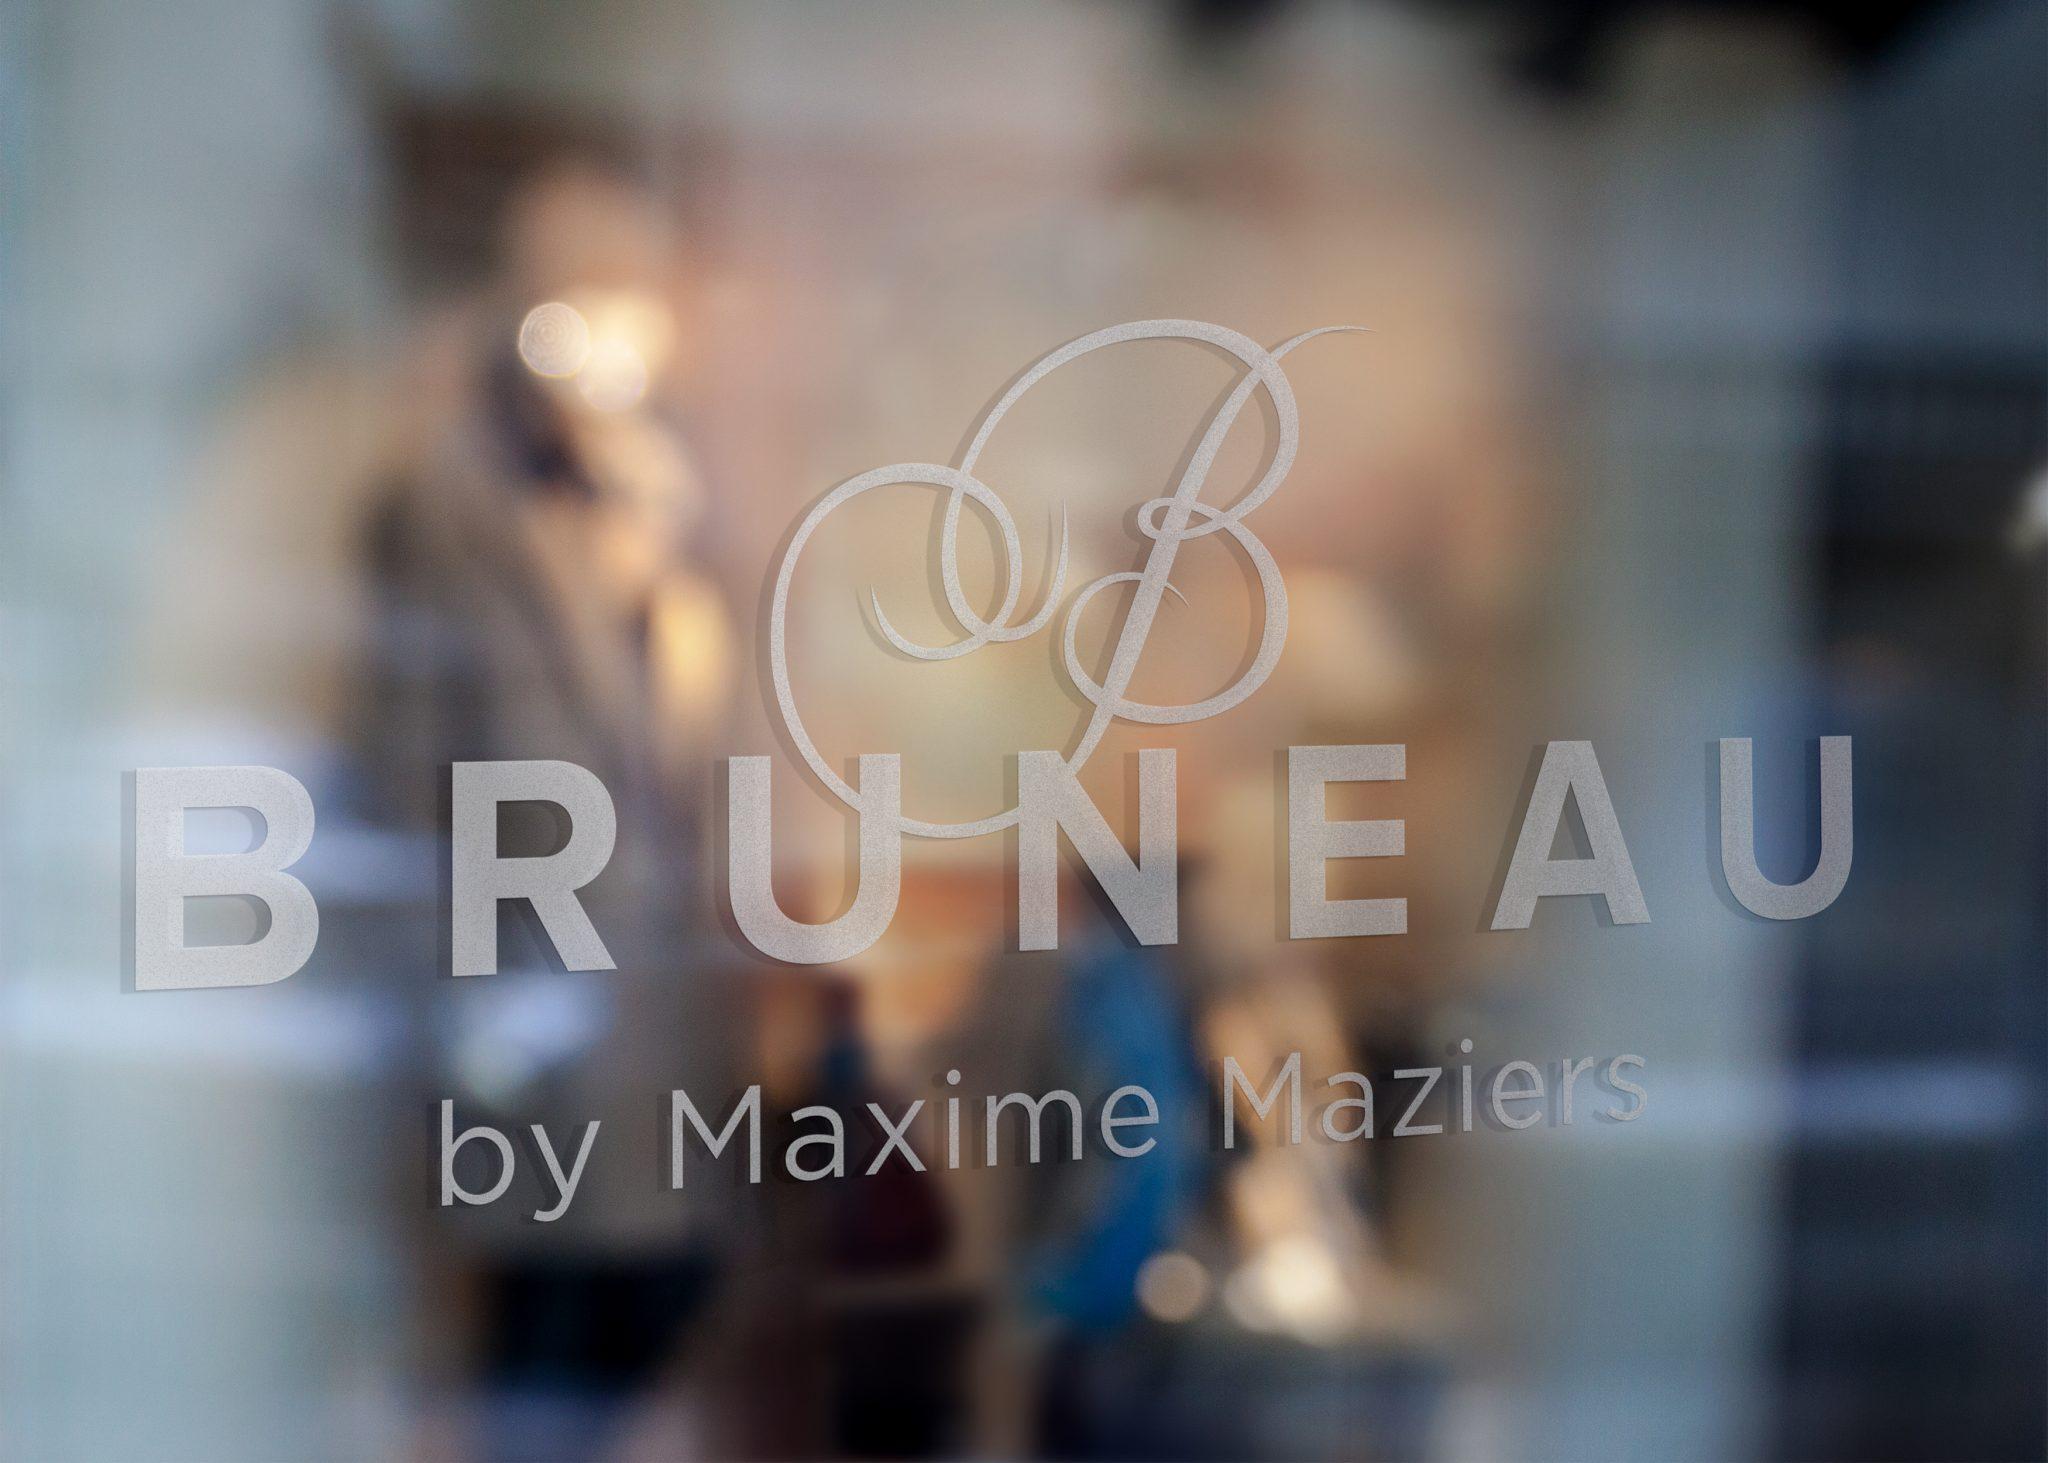 studio witvrouwen graphic design identity branding logotype logo Maxime Maziers chef restaurant